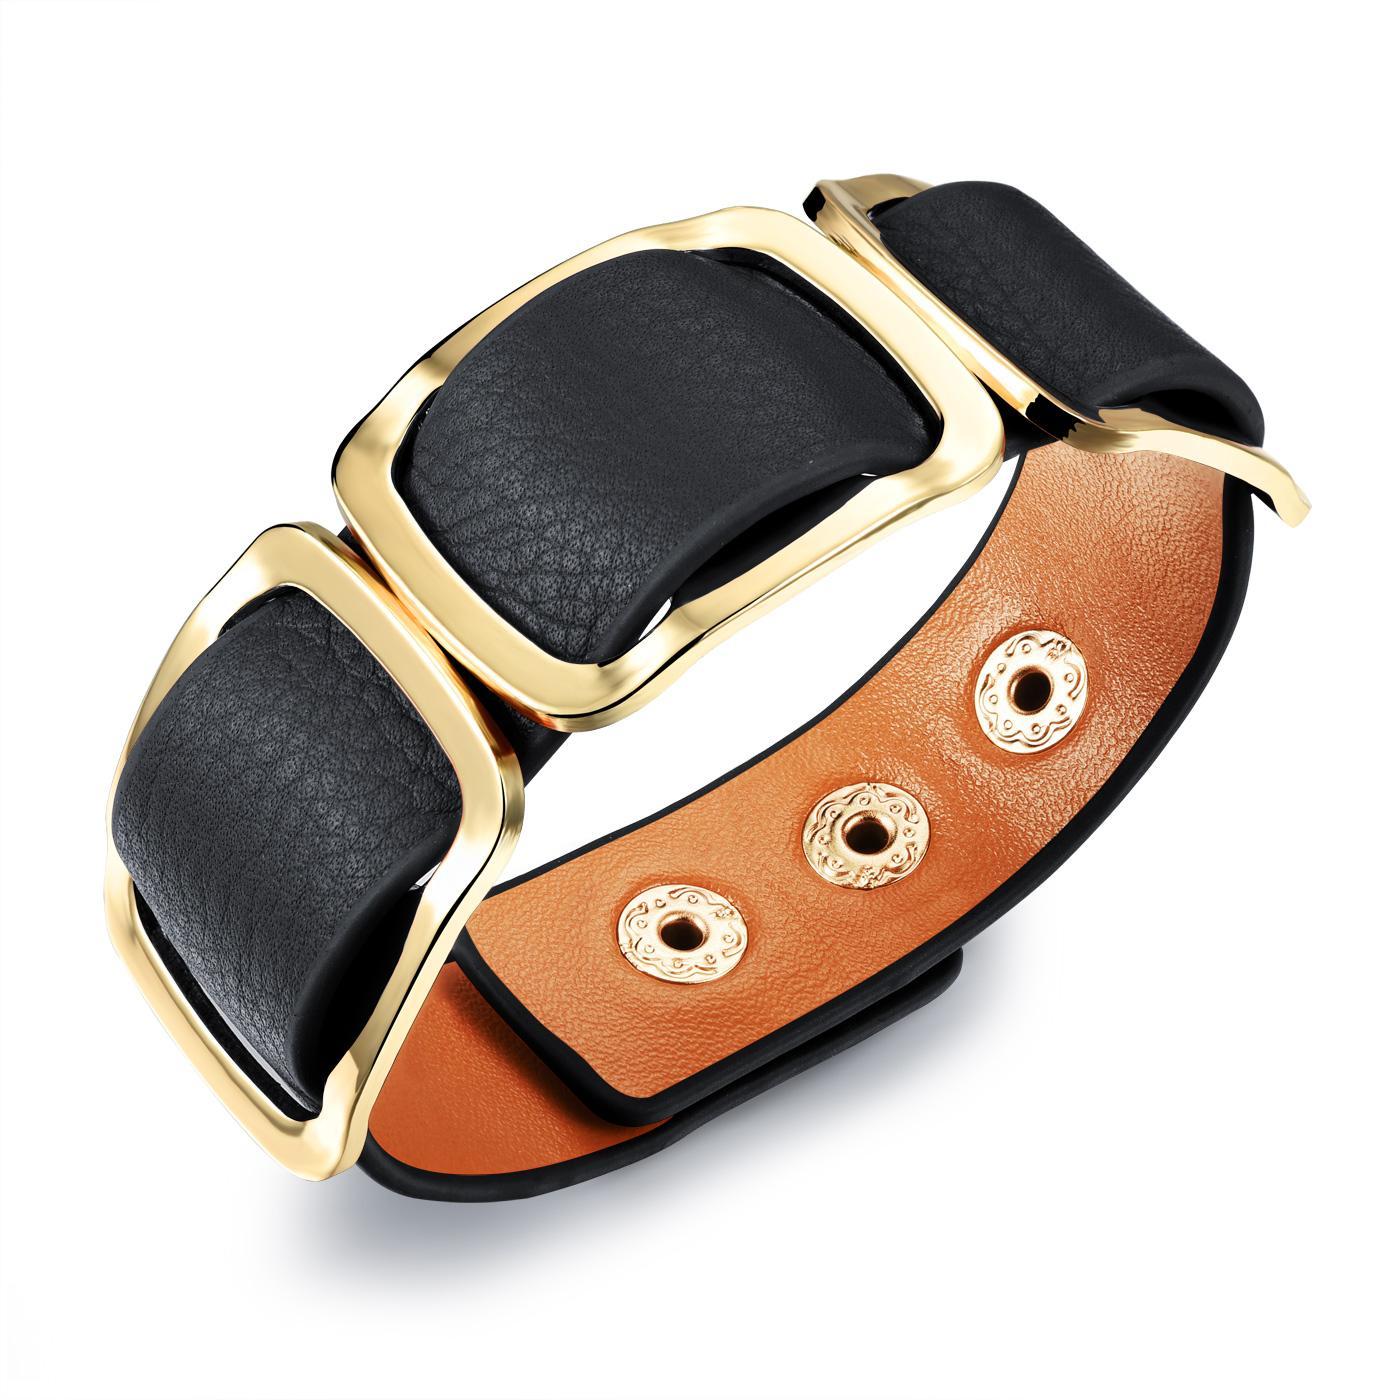 Fashion Women Wide Leather Bracelet Jewelry Chunky Leather Cuff Bracelet  With Buckles Adjust To Your Wrist